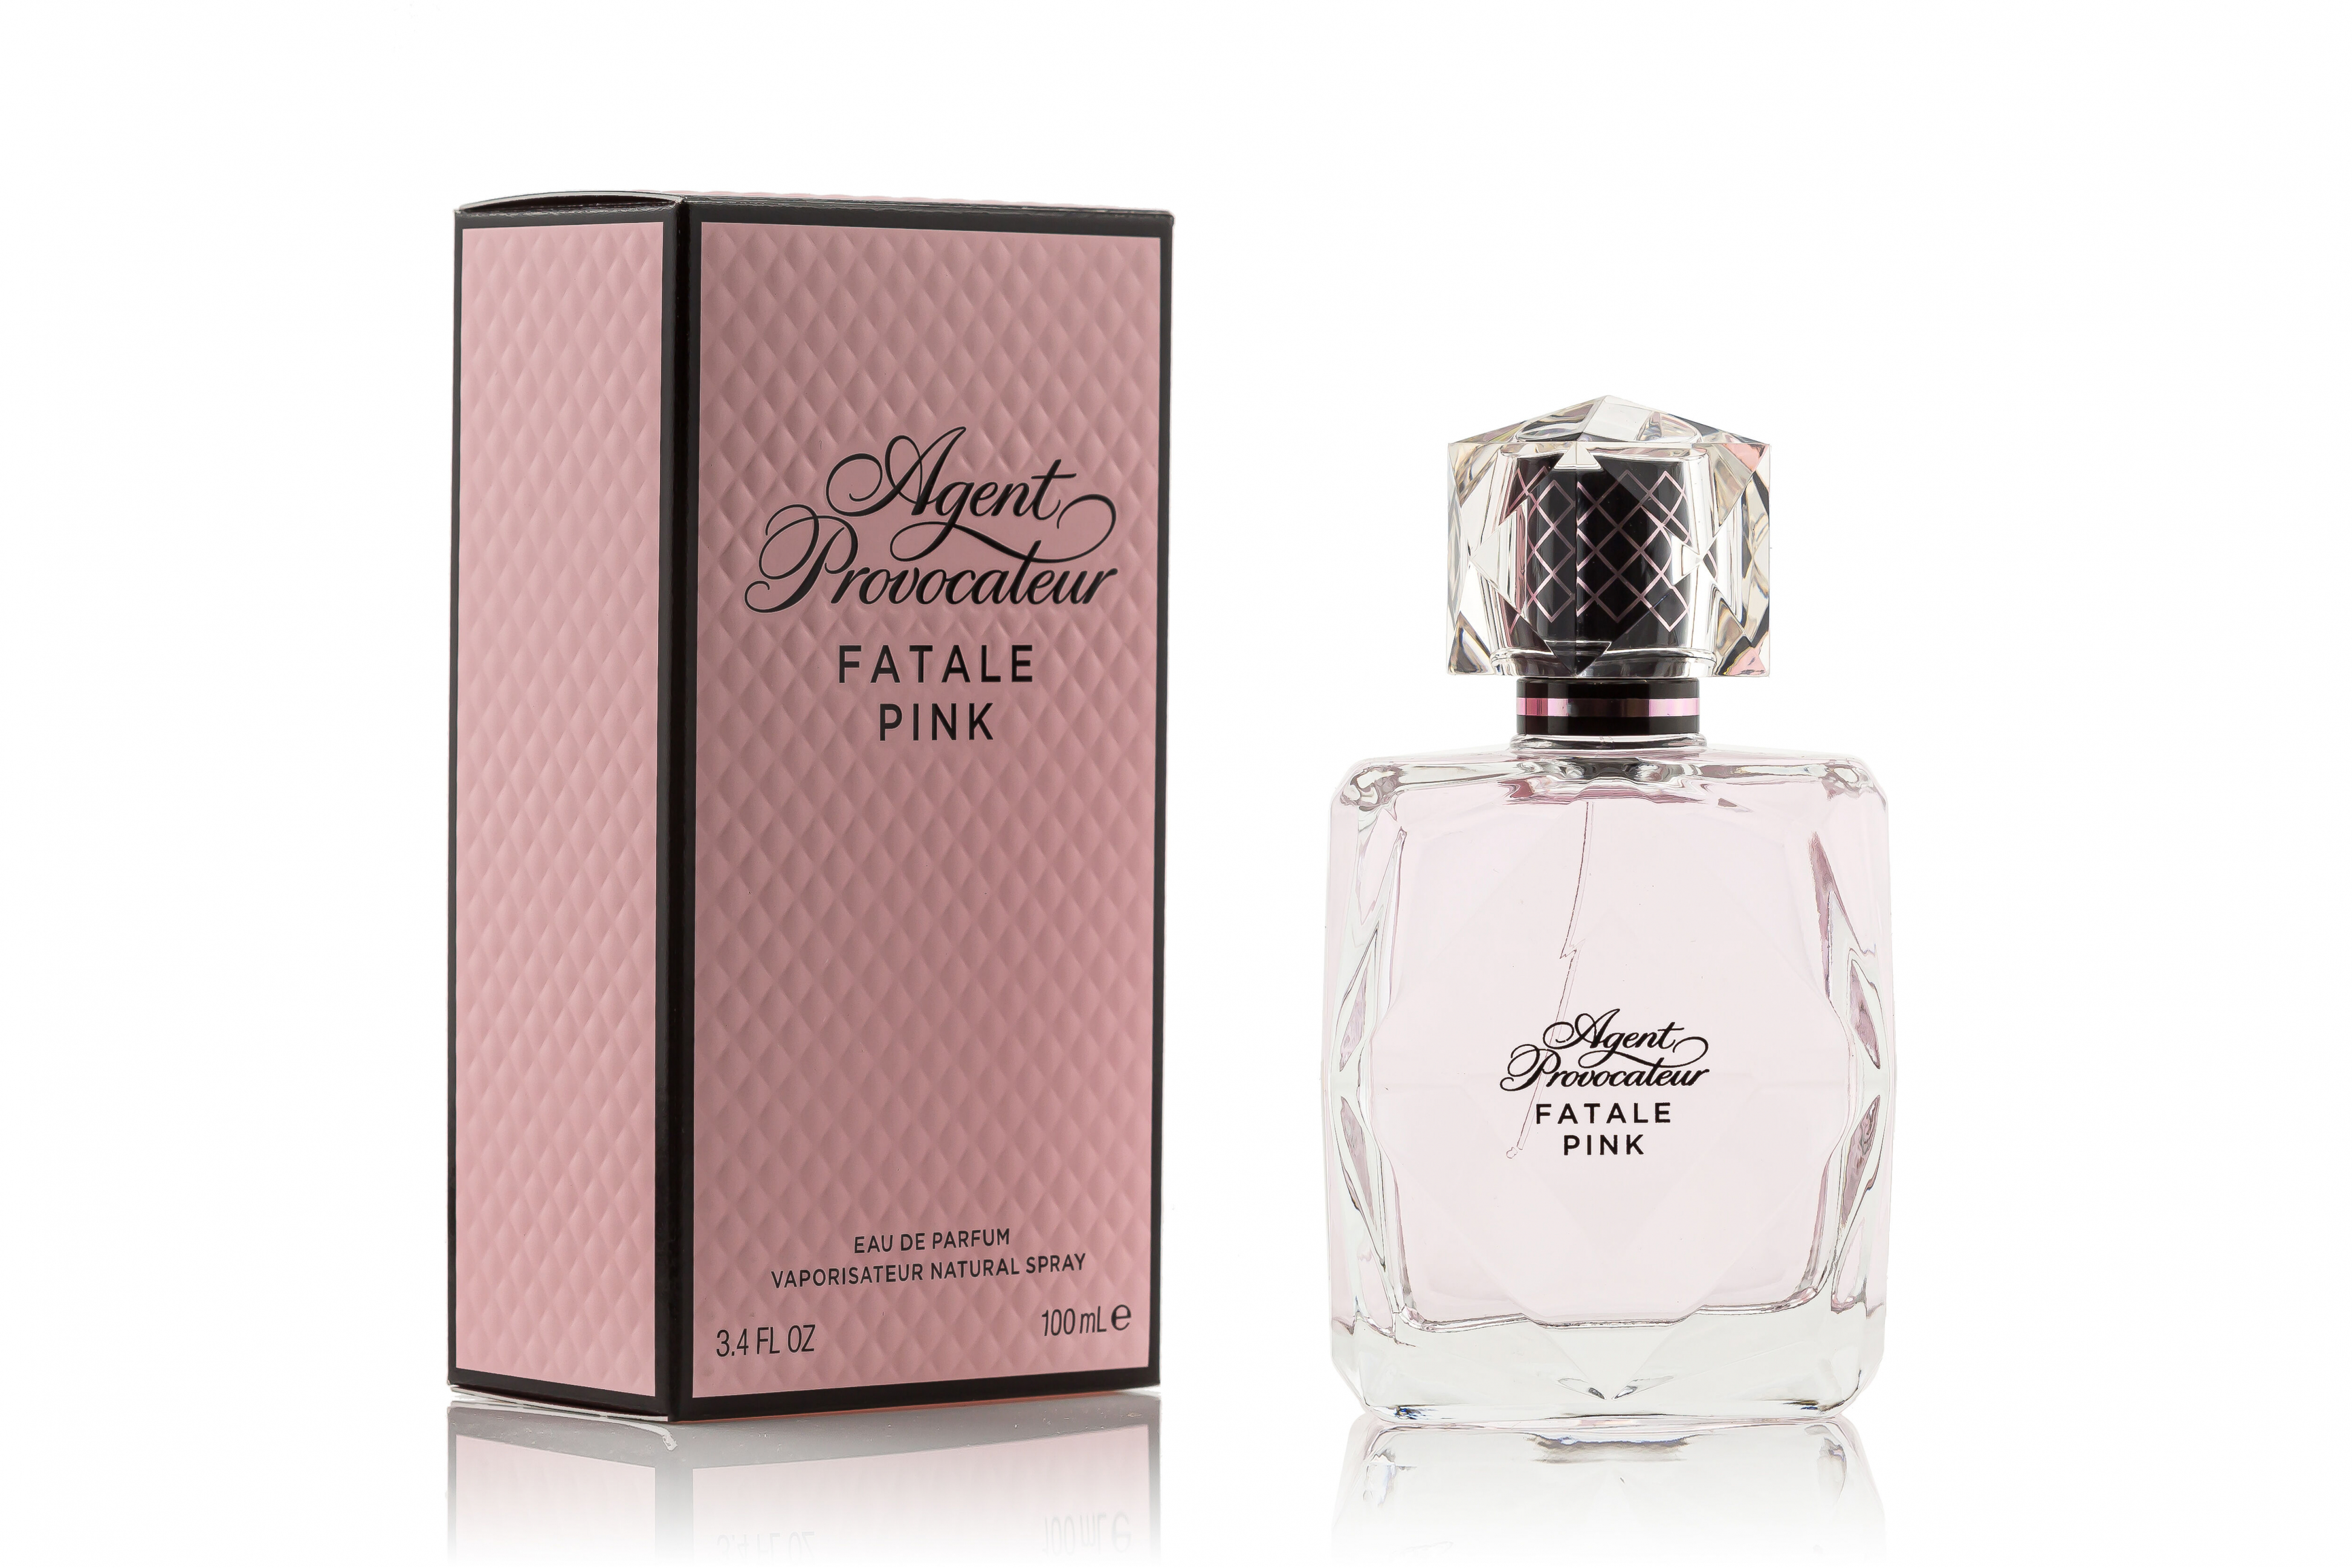 Agent Provocateur Fatale Pink Парфюмированная вода 100 ml (085715731012)